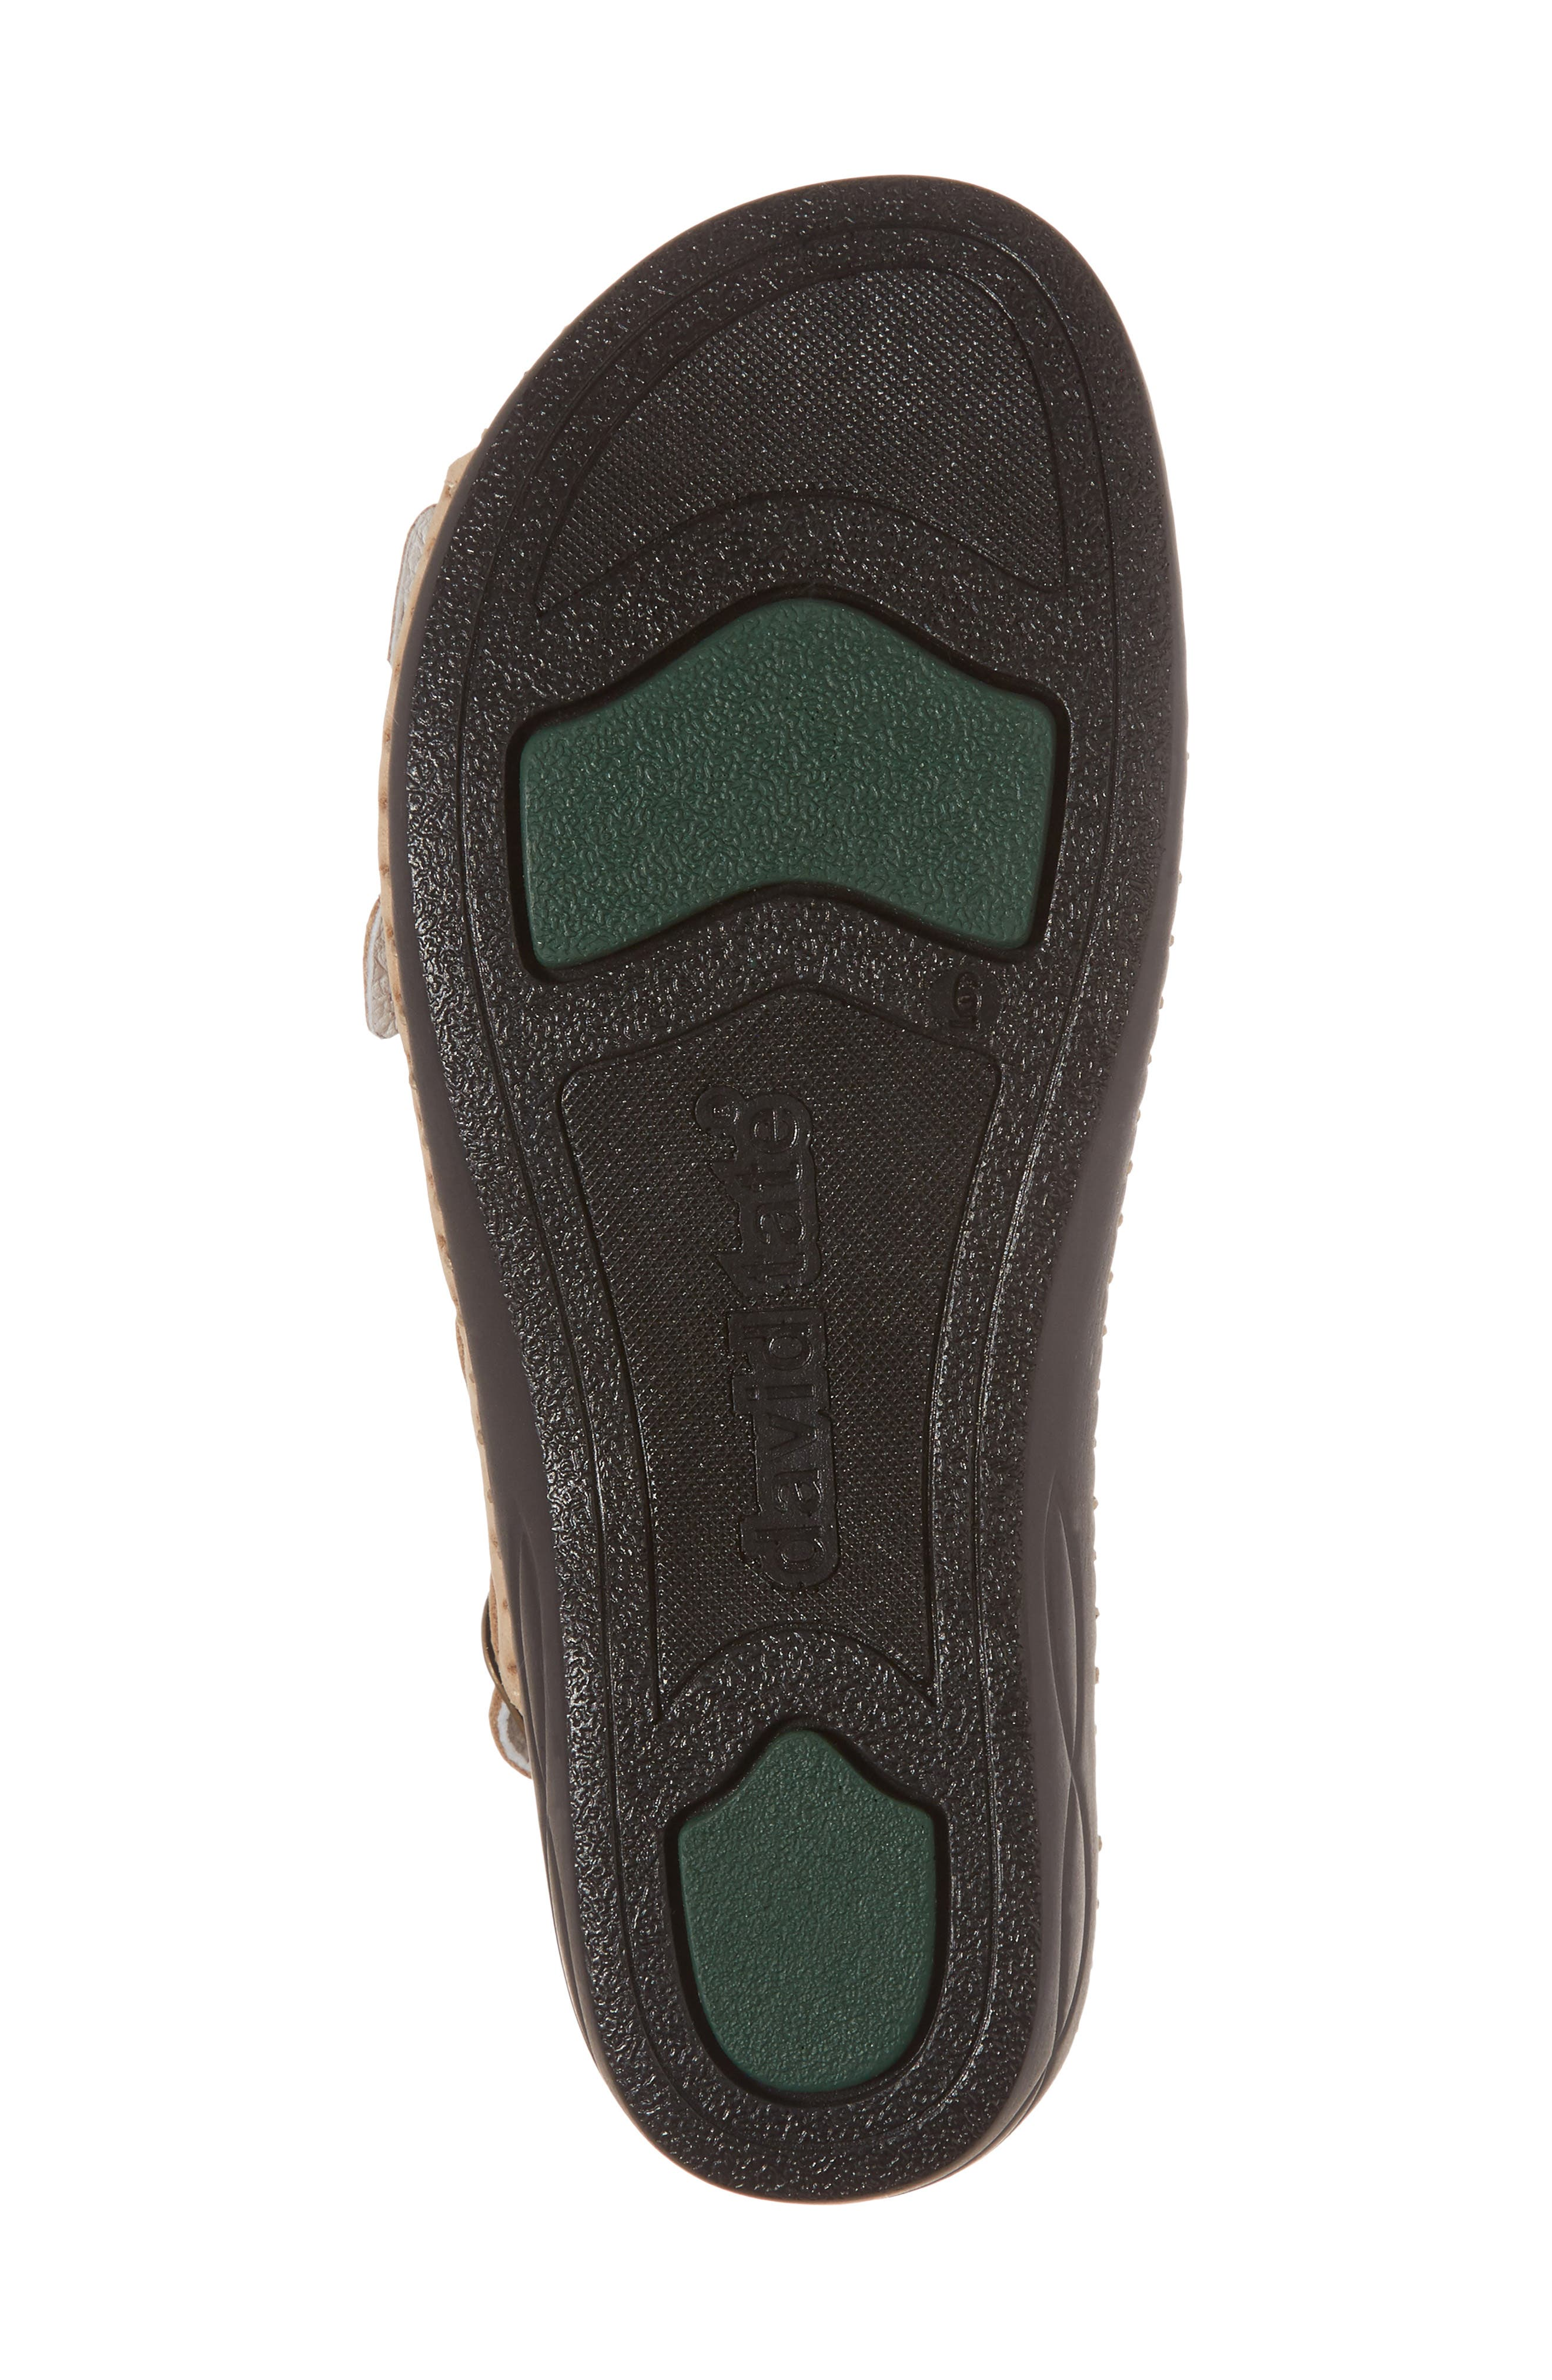 Luna Slingback Wedge Sandal,                             Alternate thumbnail 6, color,                             Cappuccino Nubuck